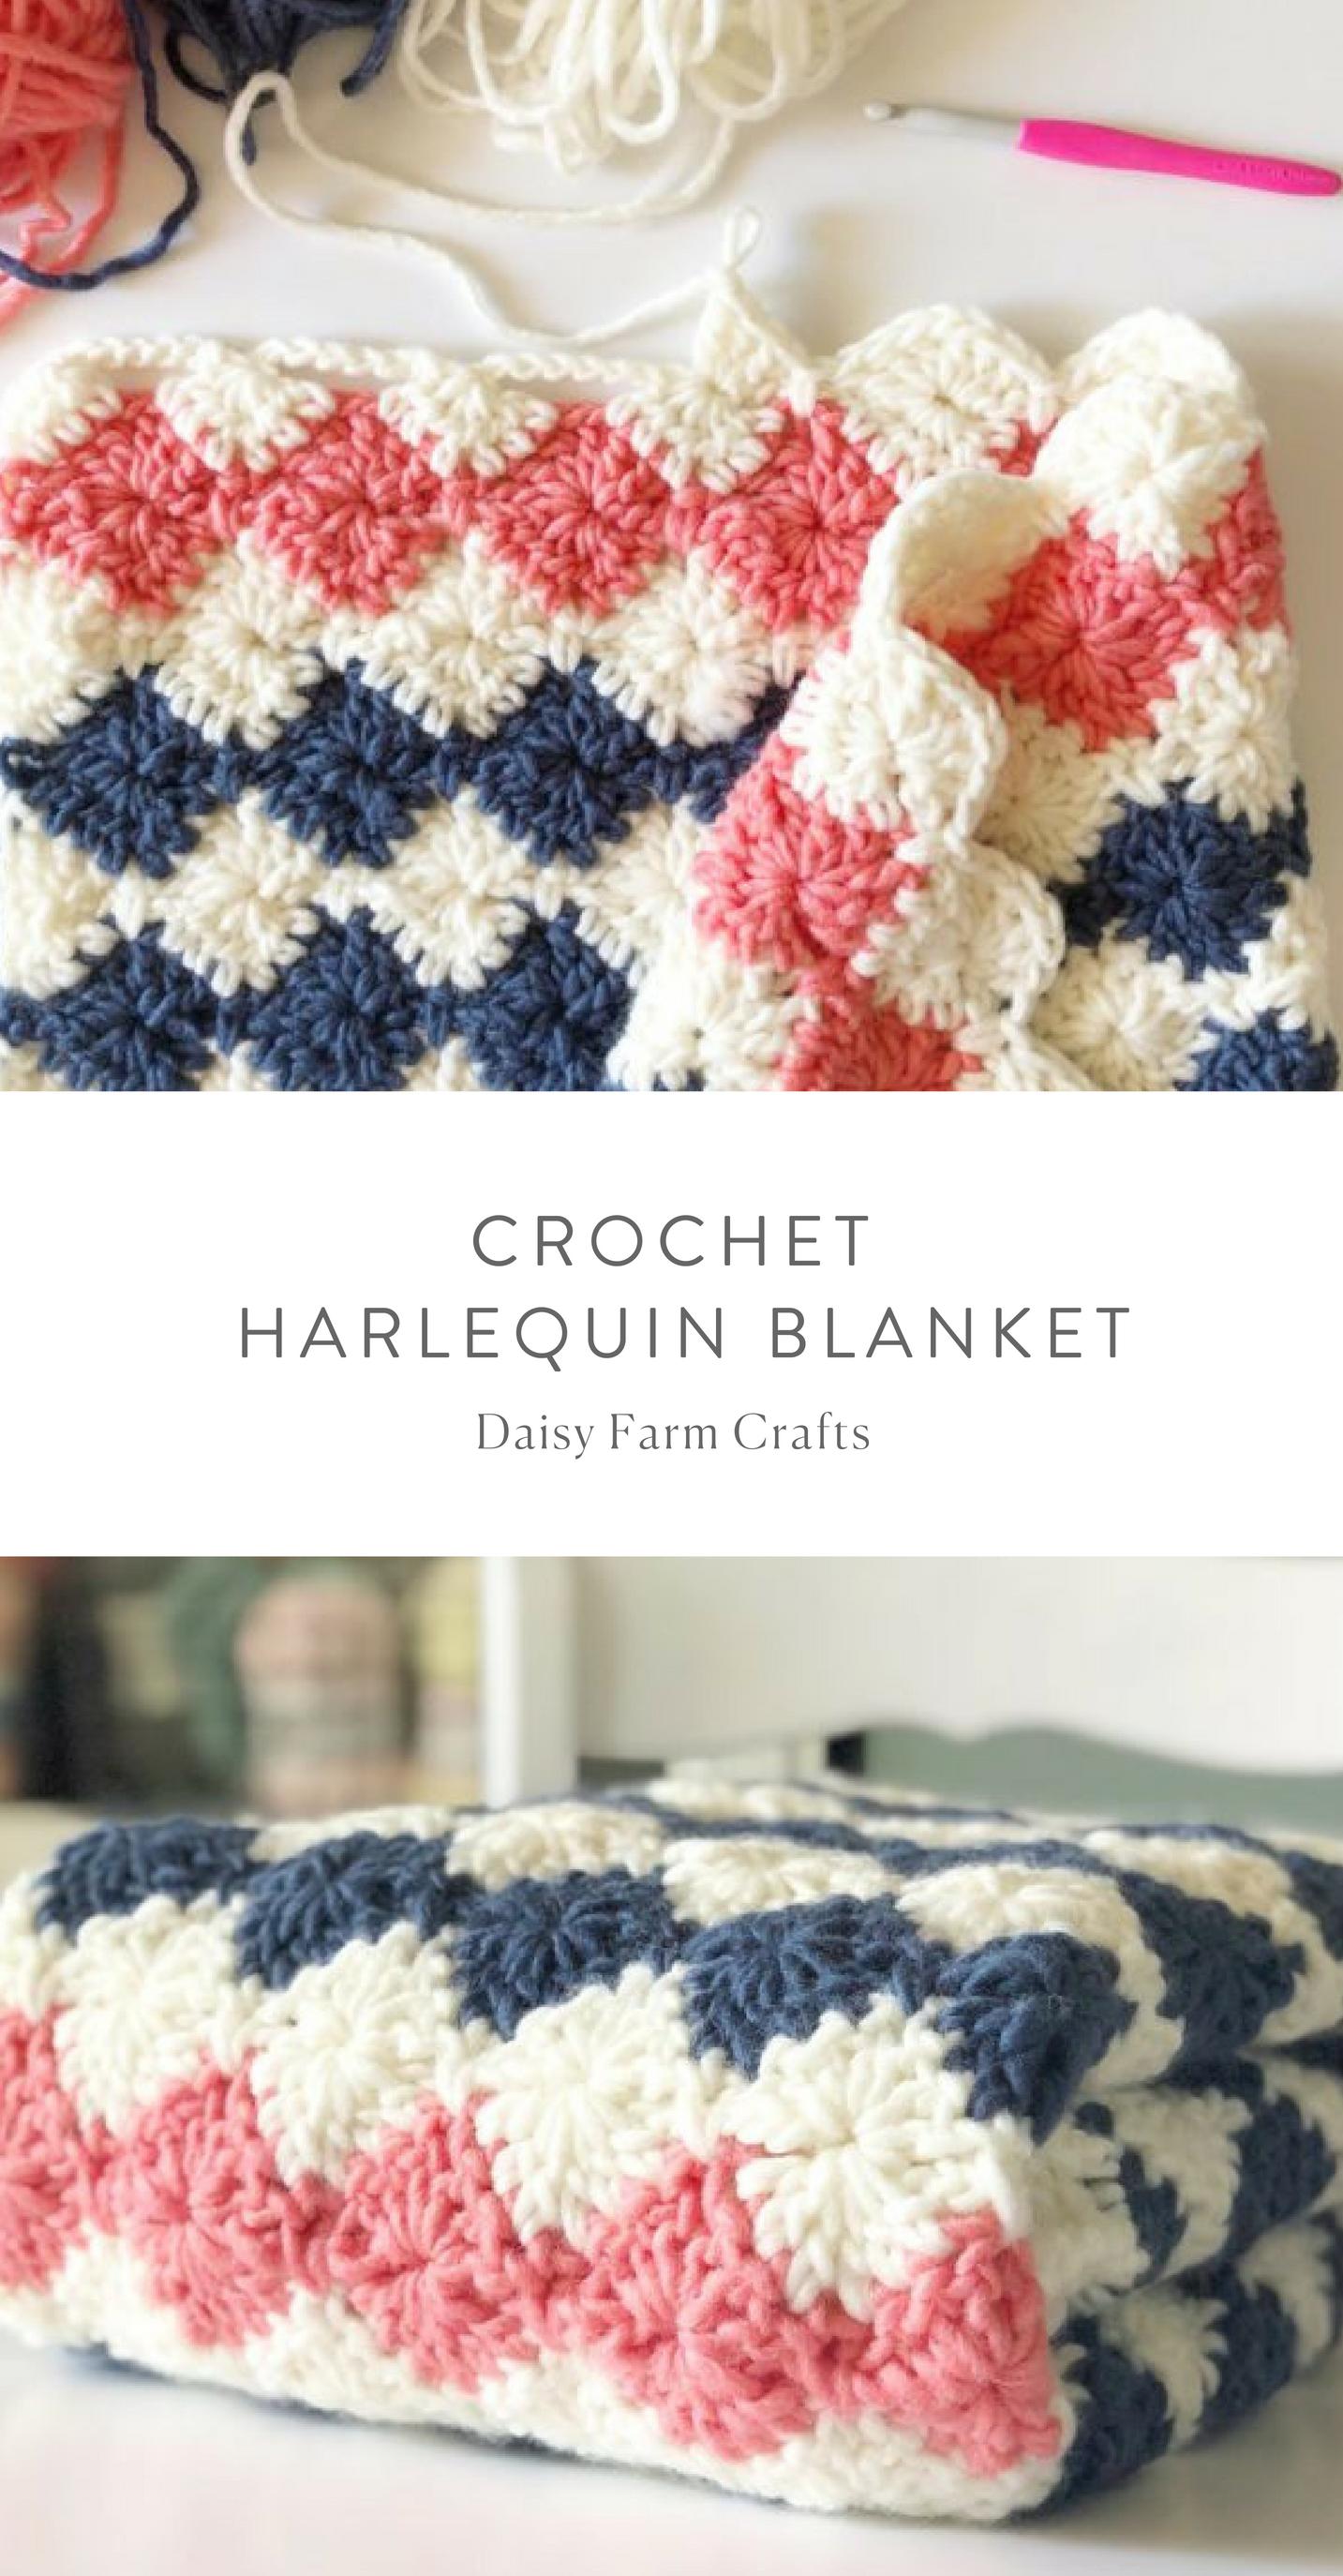 FREE #Crochet Pattern: Crochet Harlequin Blanket #crochet #crochetpatterns